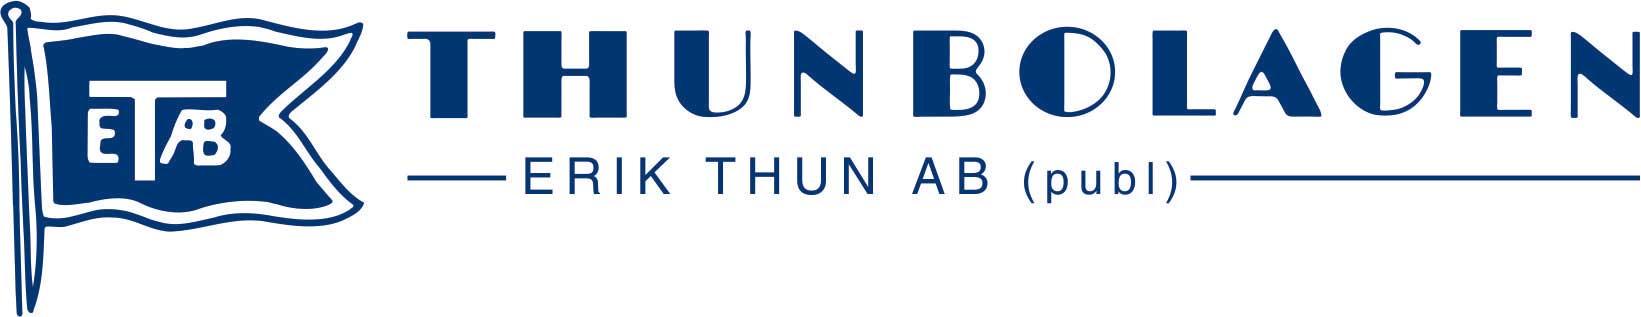 logotyp Thunbolagen